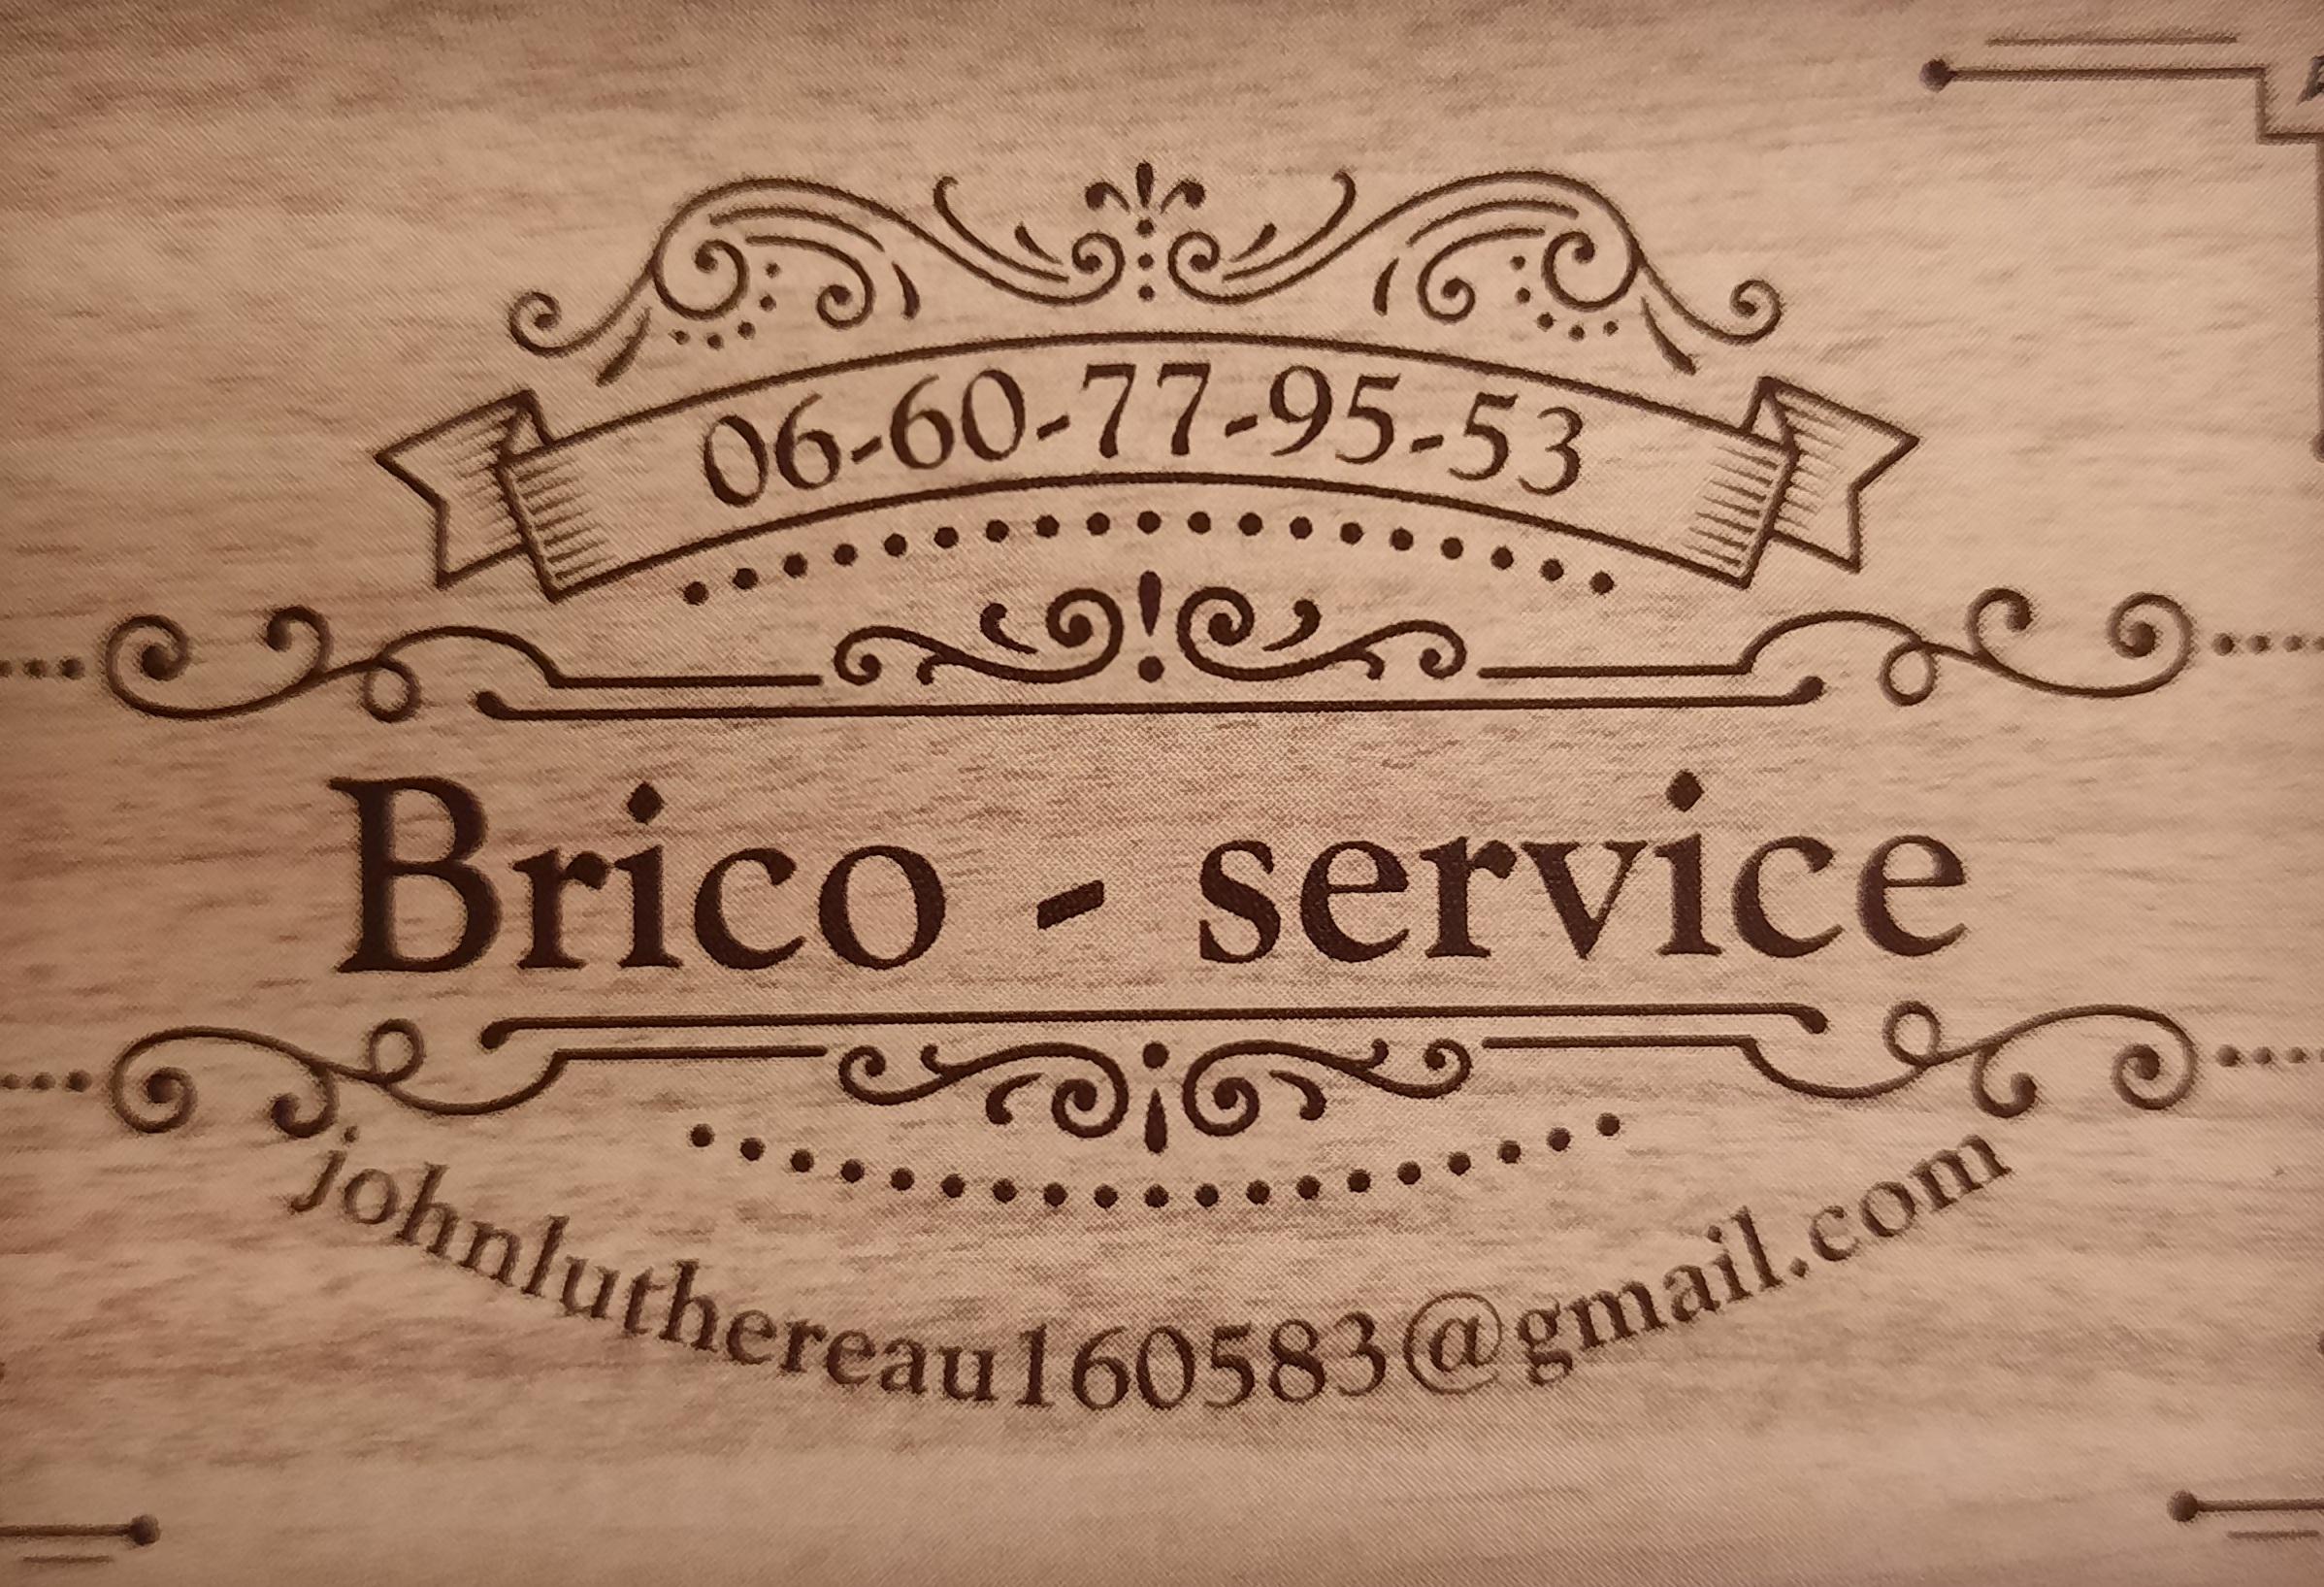 brico service.jpg